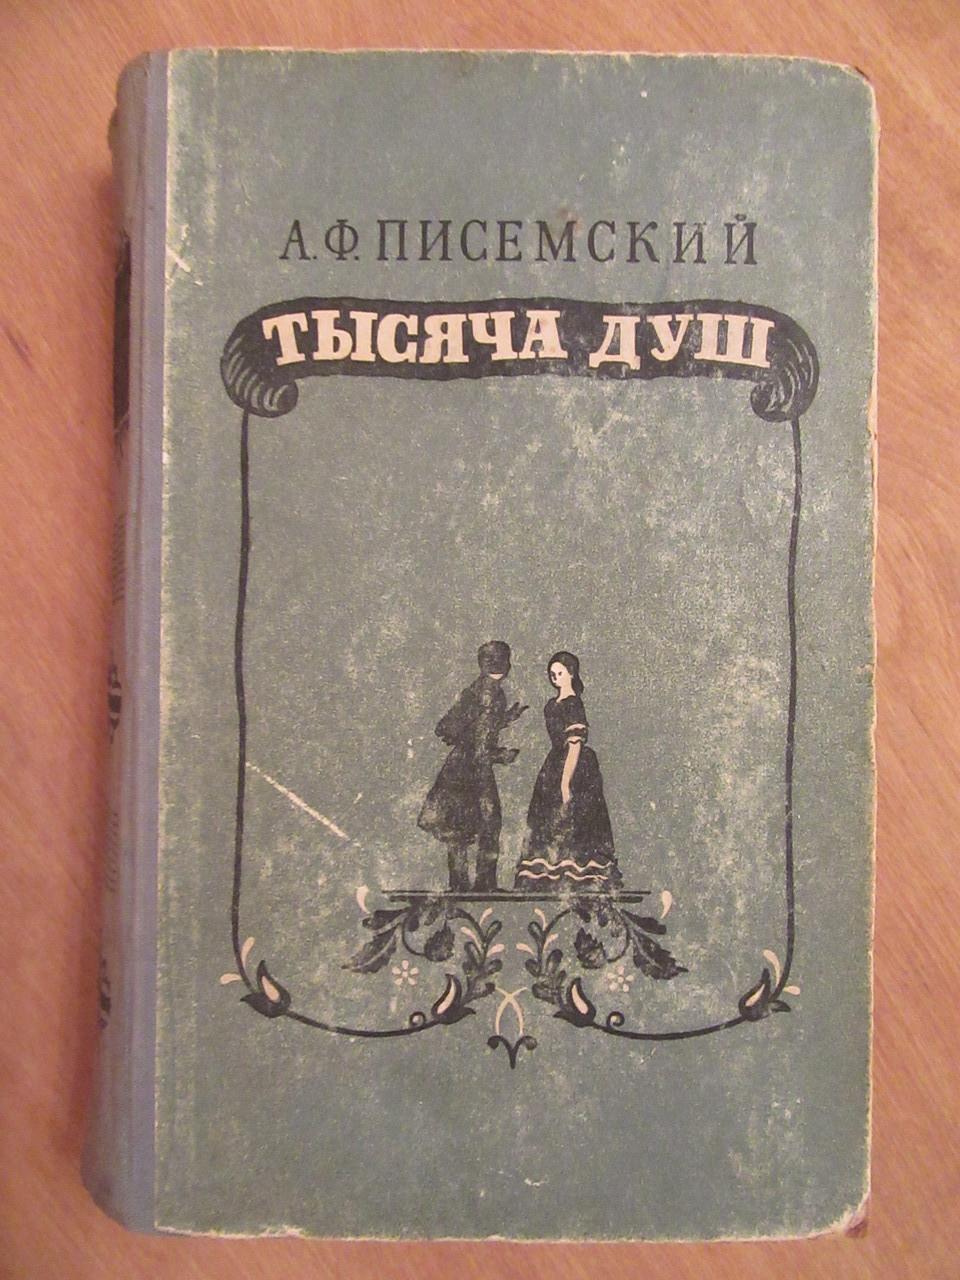 А.Ф.Писемский. Тысяча душ. 1955г